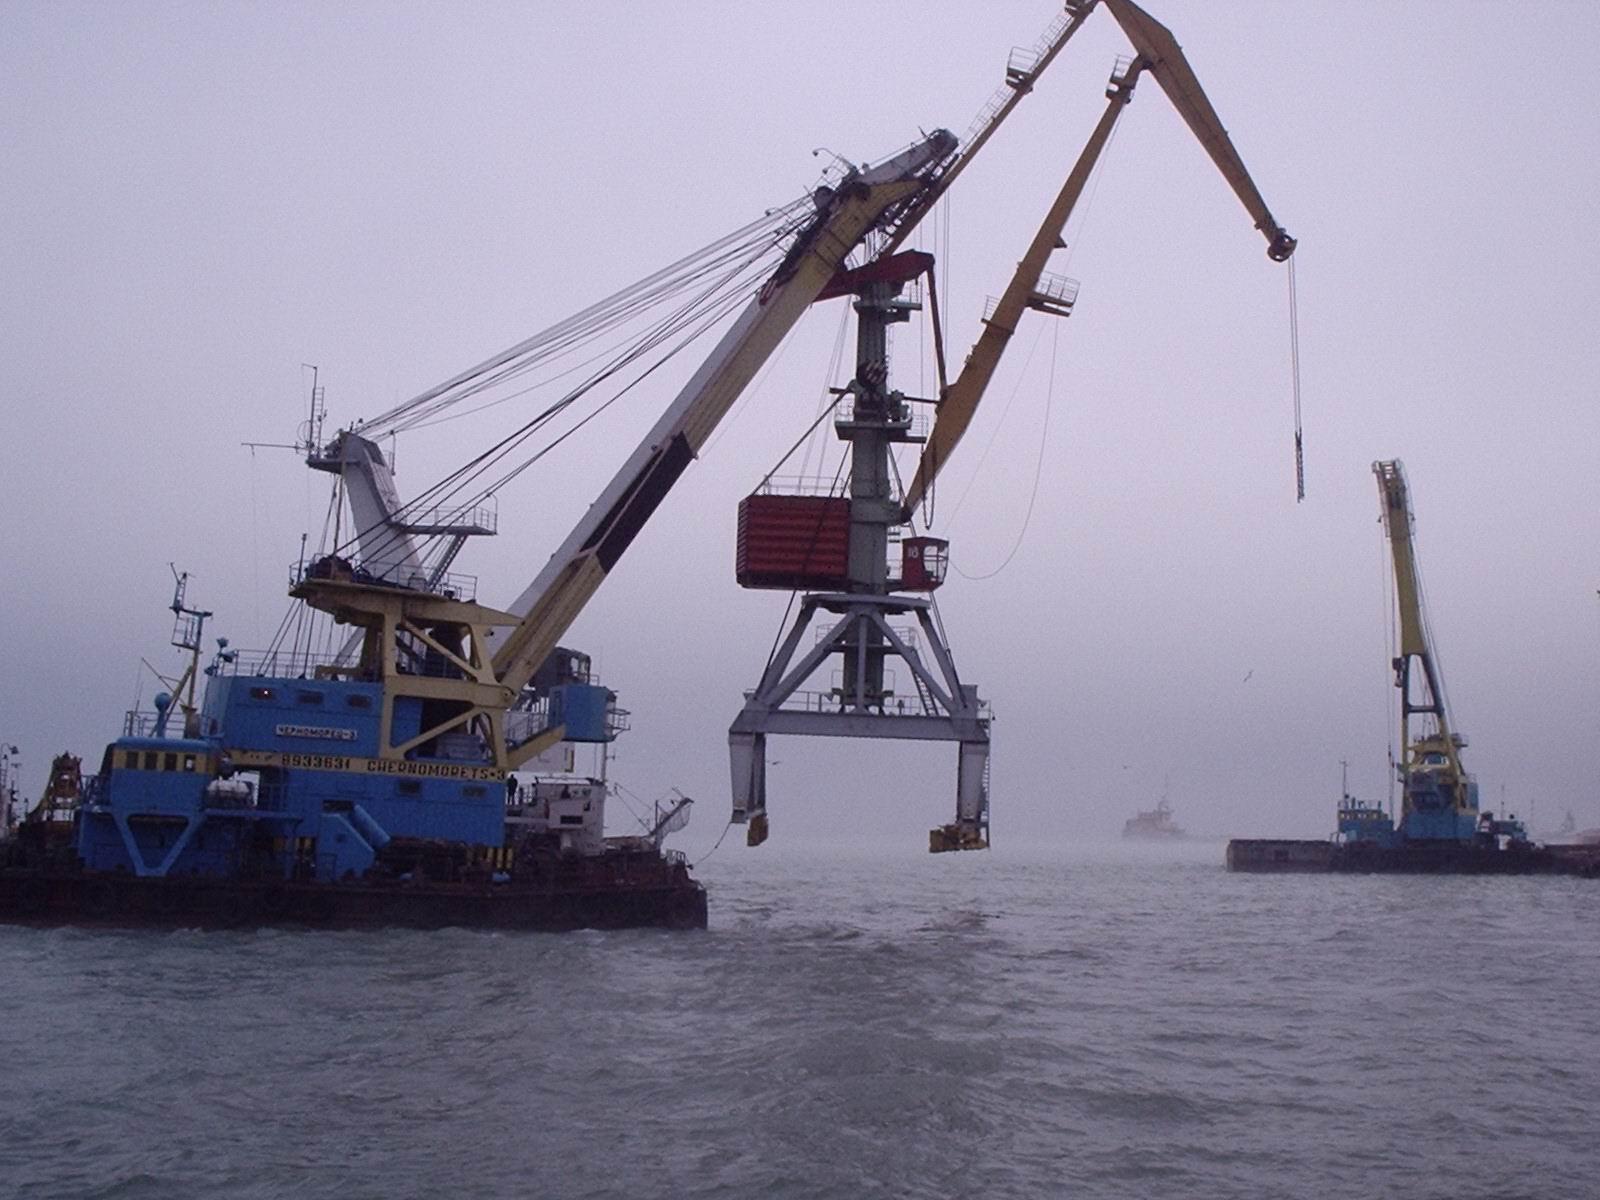 Перебазирование портального крана плавучим краном без демонтажа